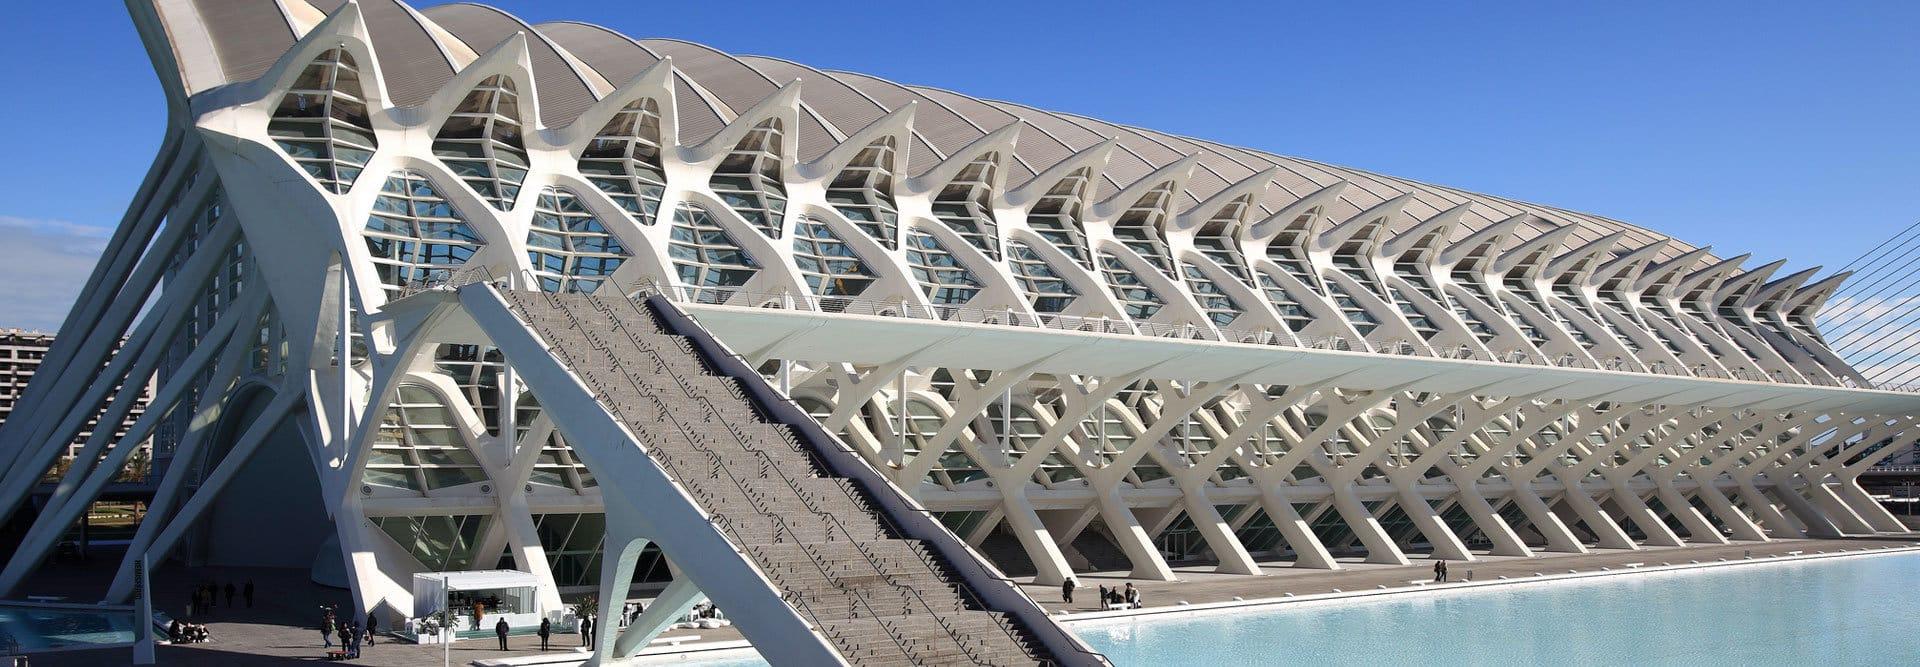 Principe-Felipe-sciences-museum-Valencia-experiences-and-gateways